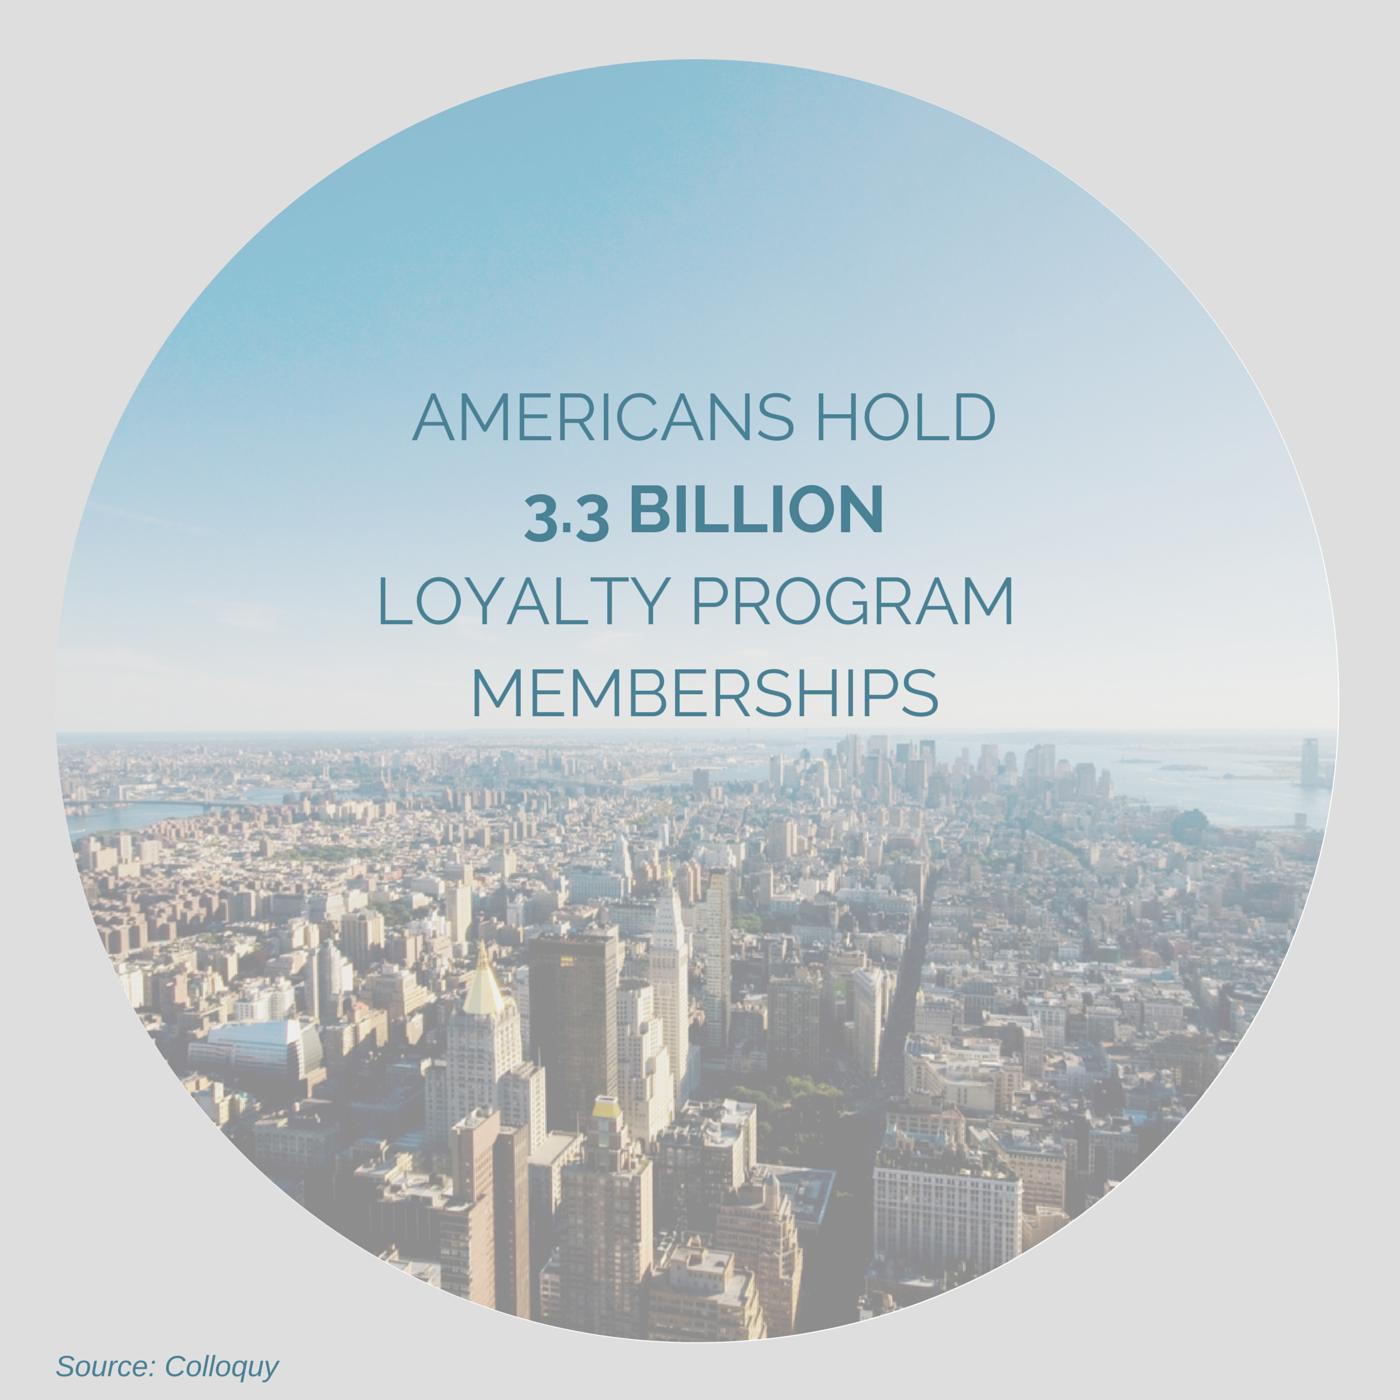 Americans_hold3.3_billionloyalty_program